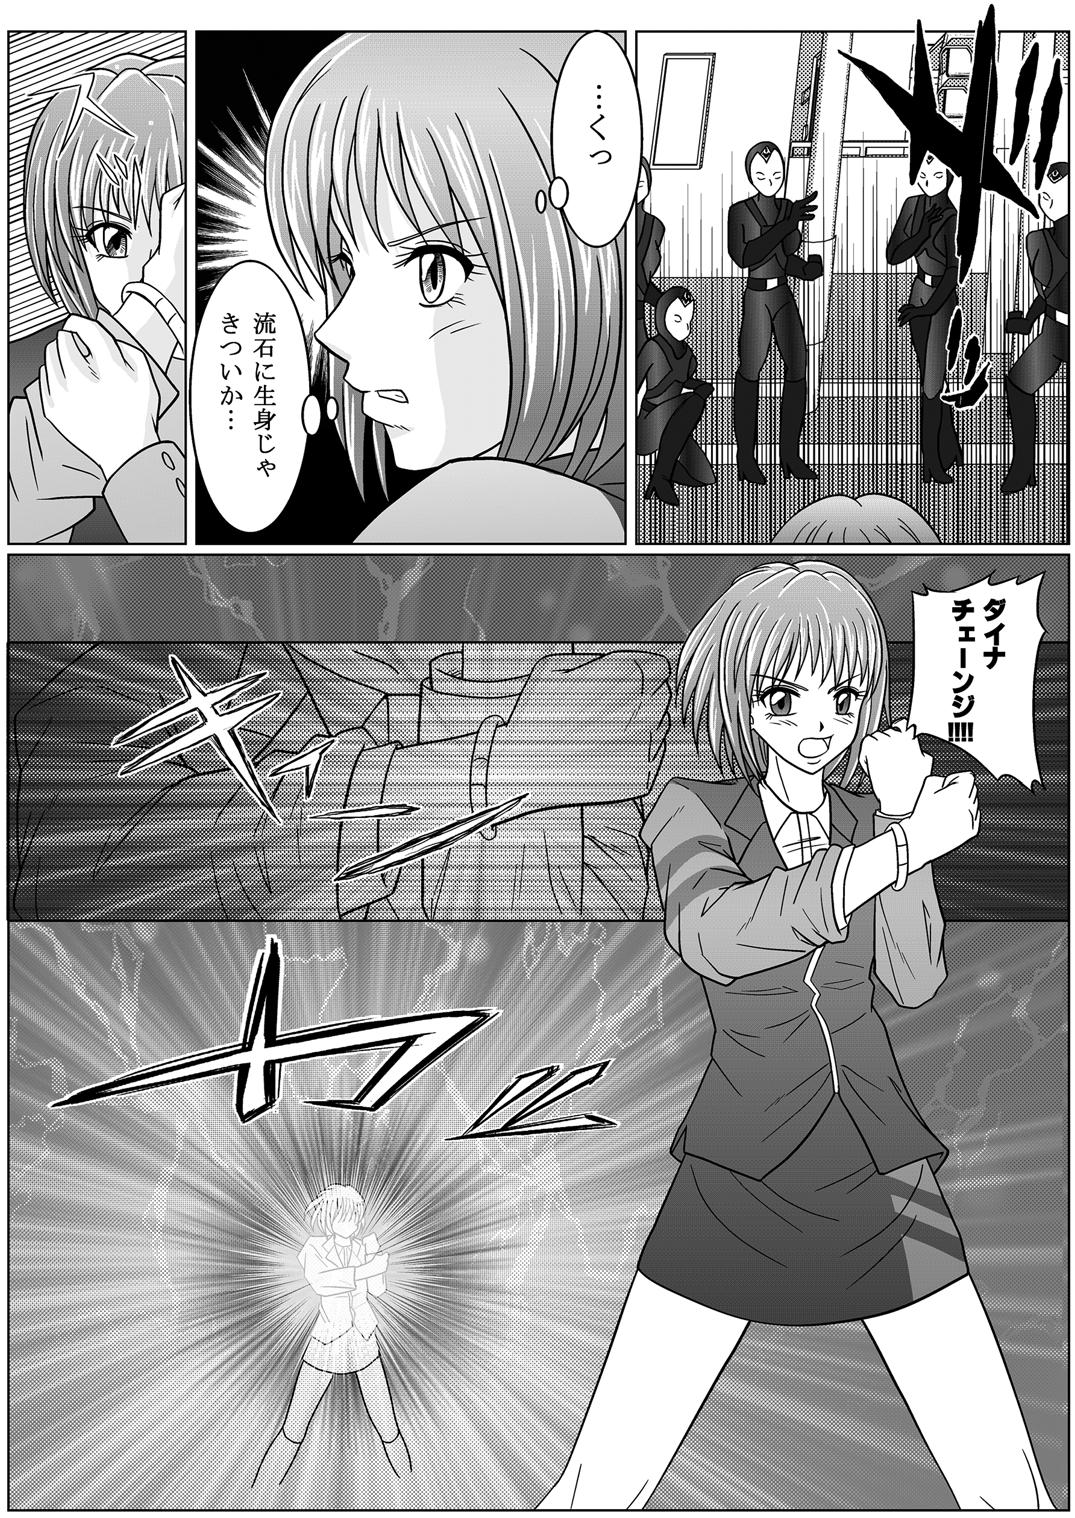 [Macxe's (monmon)] Tokubousentai Dinaranger ~Heroine Kairaku Sennou Keikaku~ Vol.01/02/03 (Renkaban) [Digital] 12